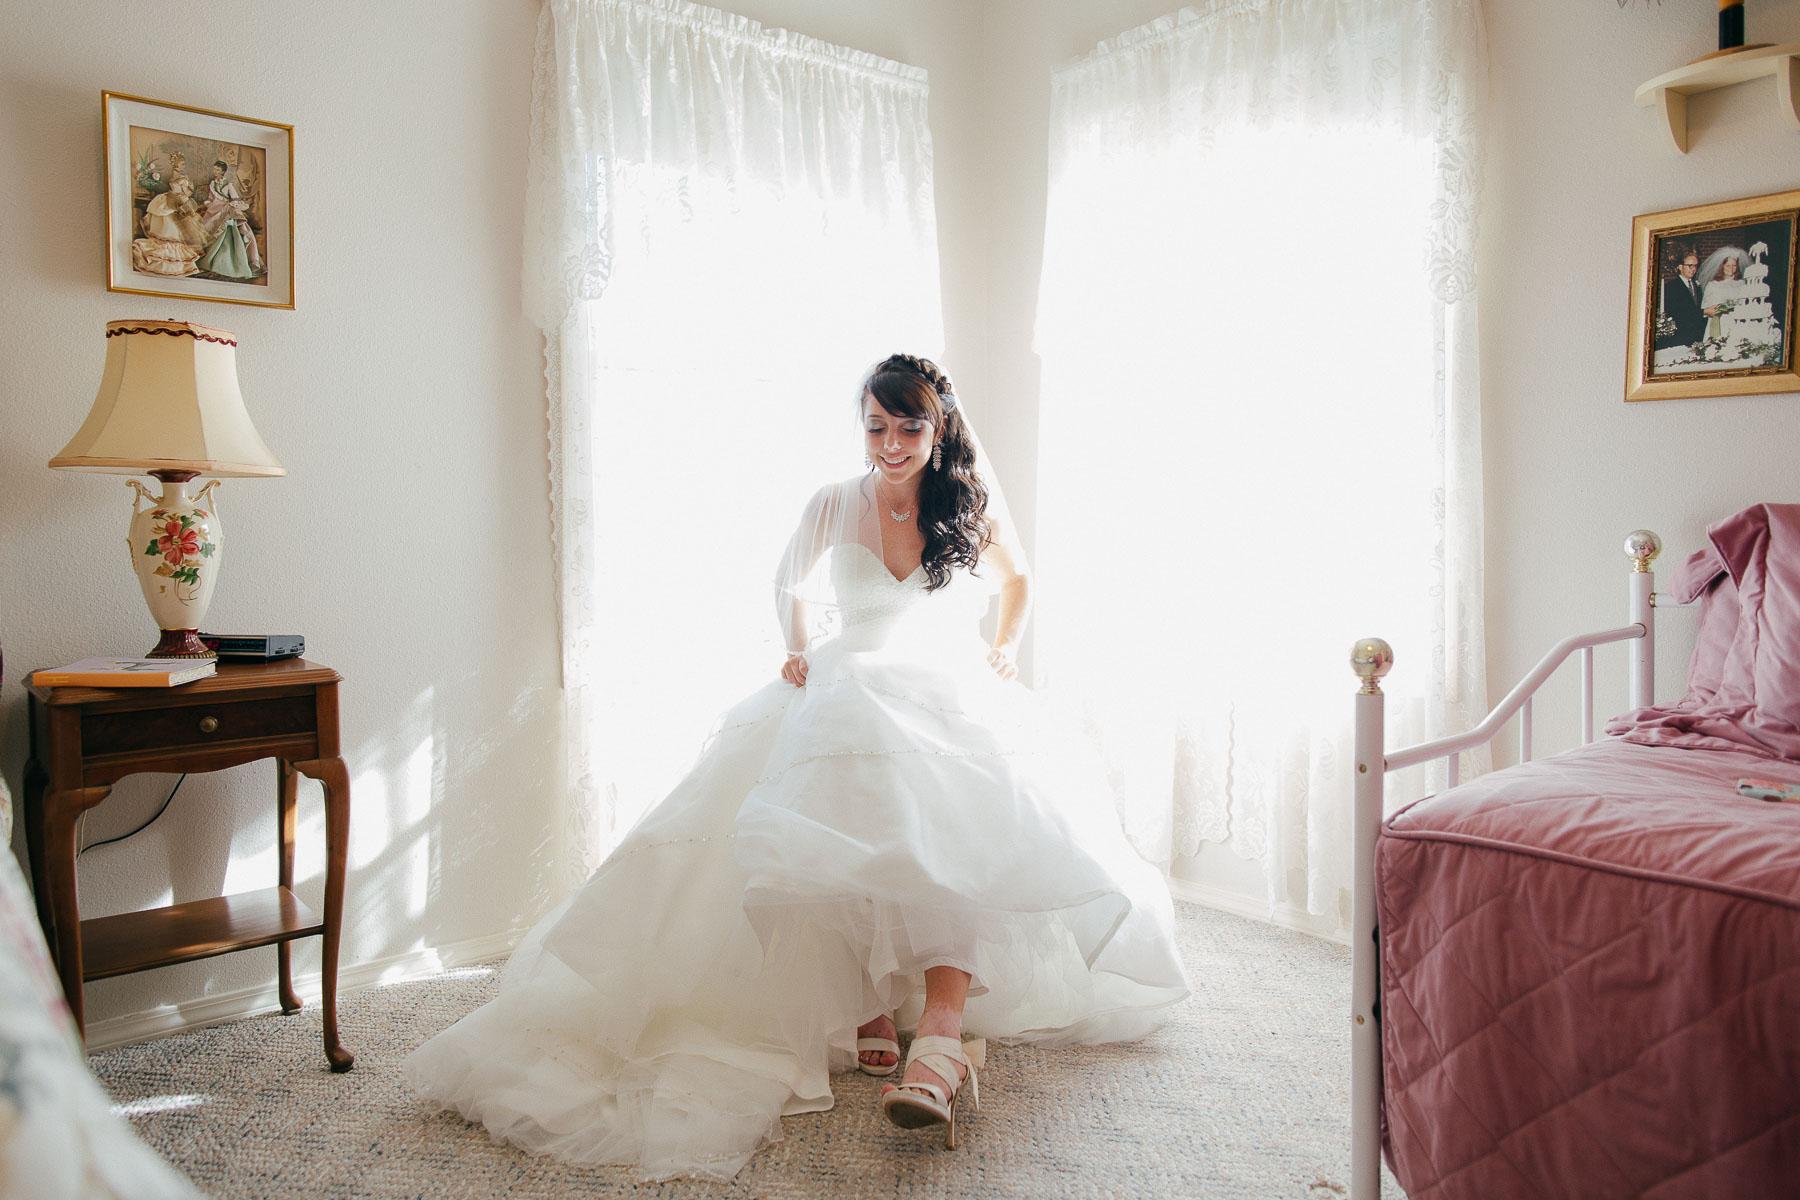 20161022-Matt-Le-Photography-October-2016-Tyler-Ashtyn-Wedding-square-6217.jpg